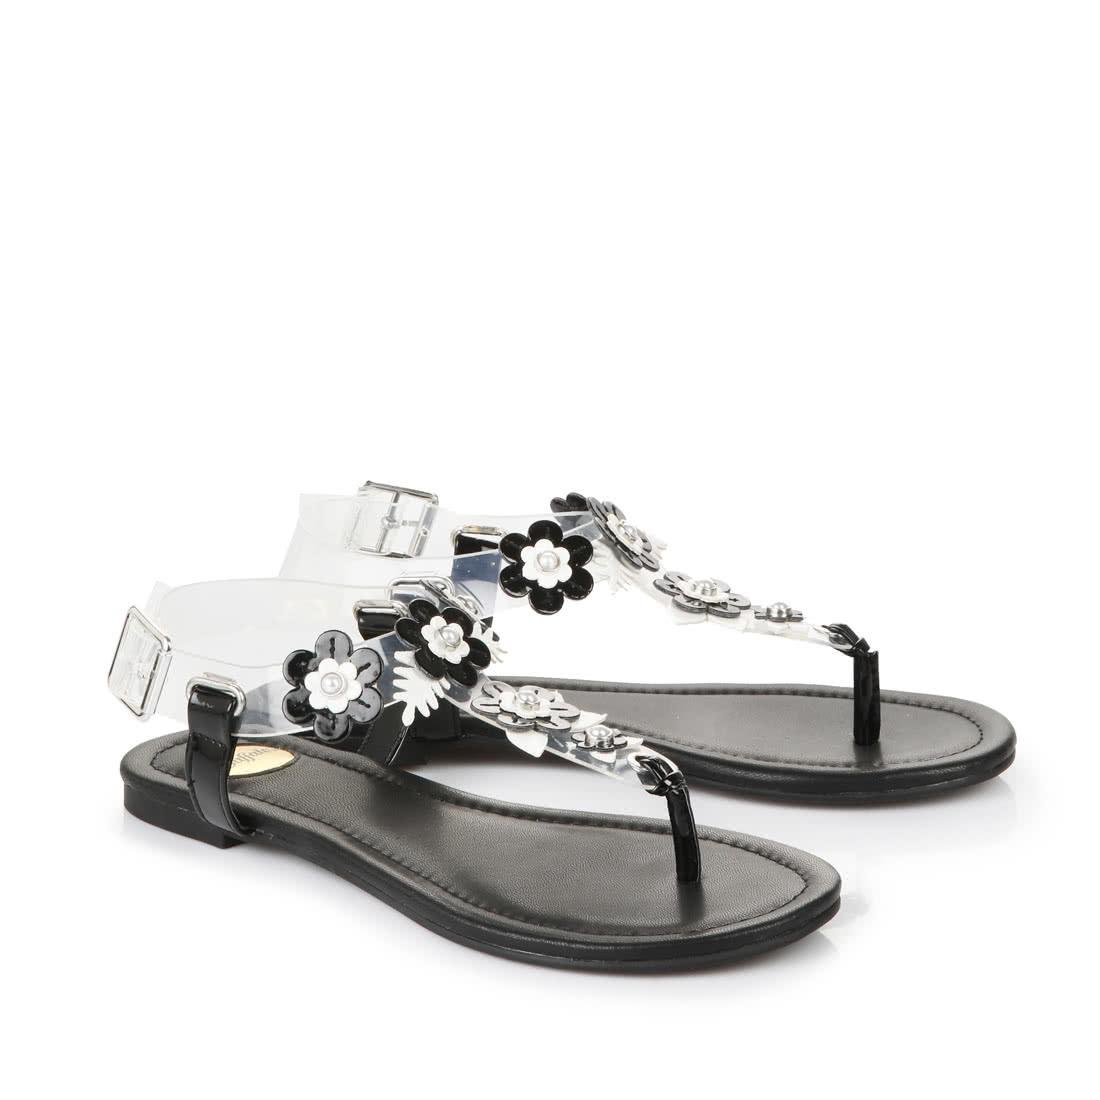 buffalo sandalen mit blumen applikationen in schwarz. Black Bedroom Furniture Sets. Home Design Ideas